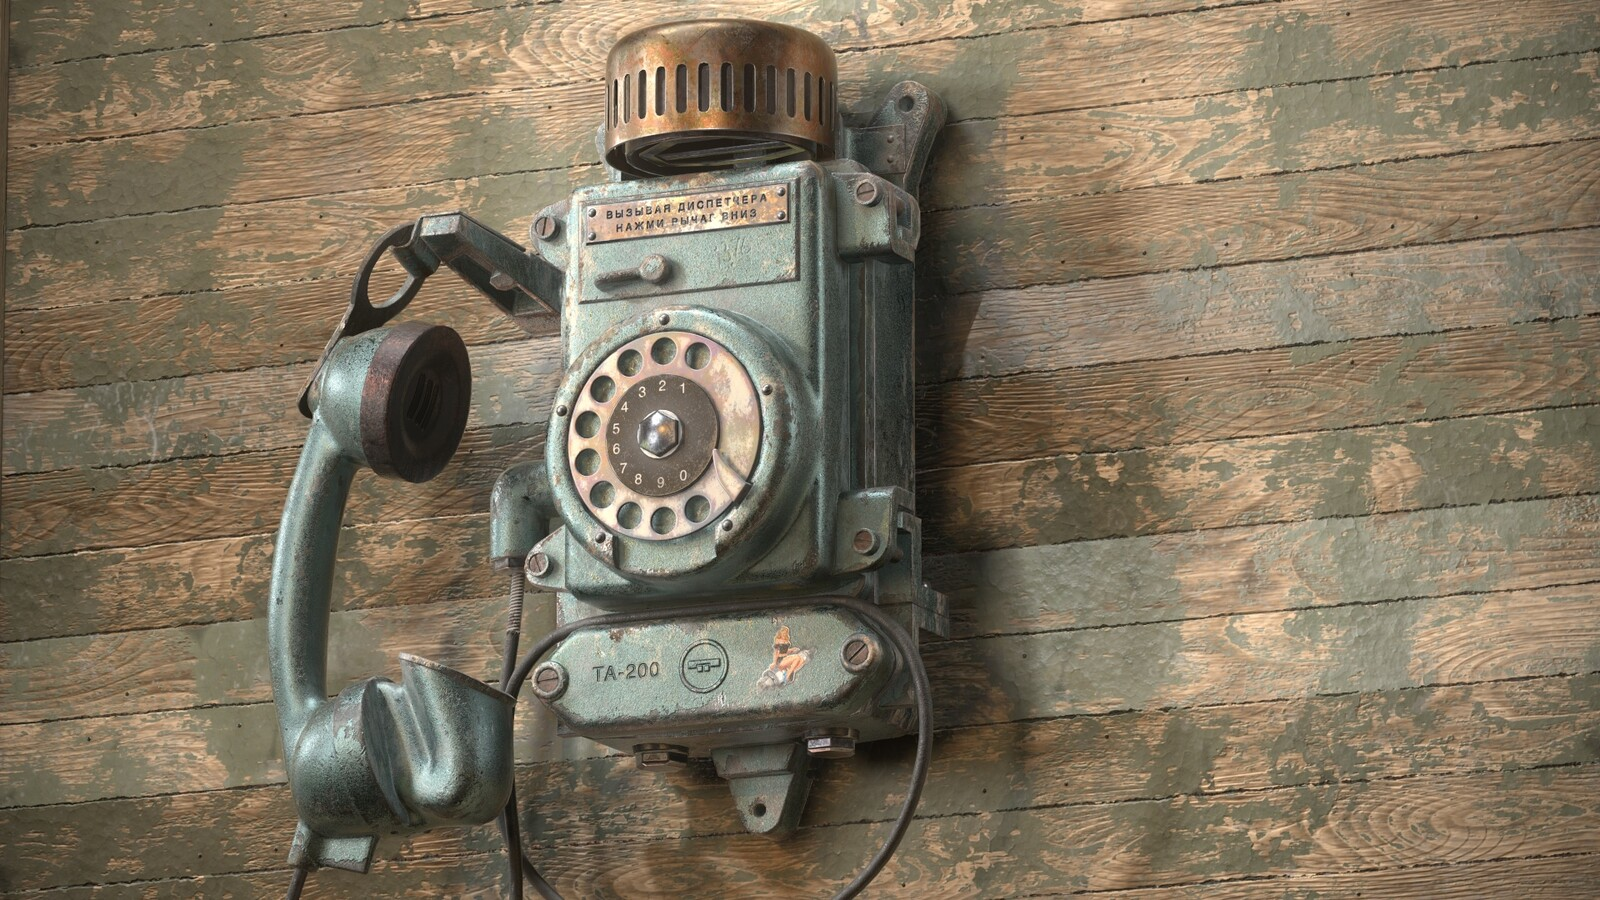 Vintage Russian Bunker telePHONE